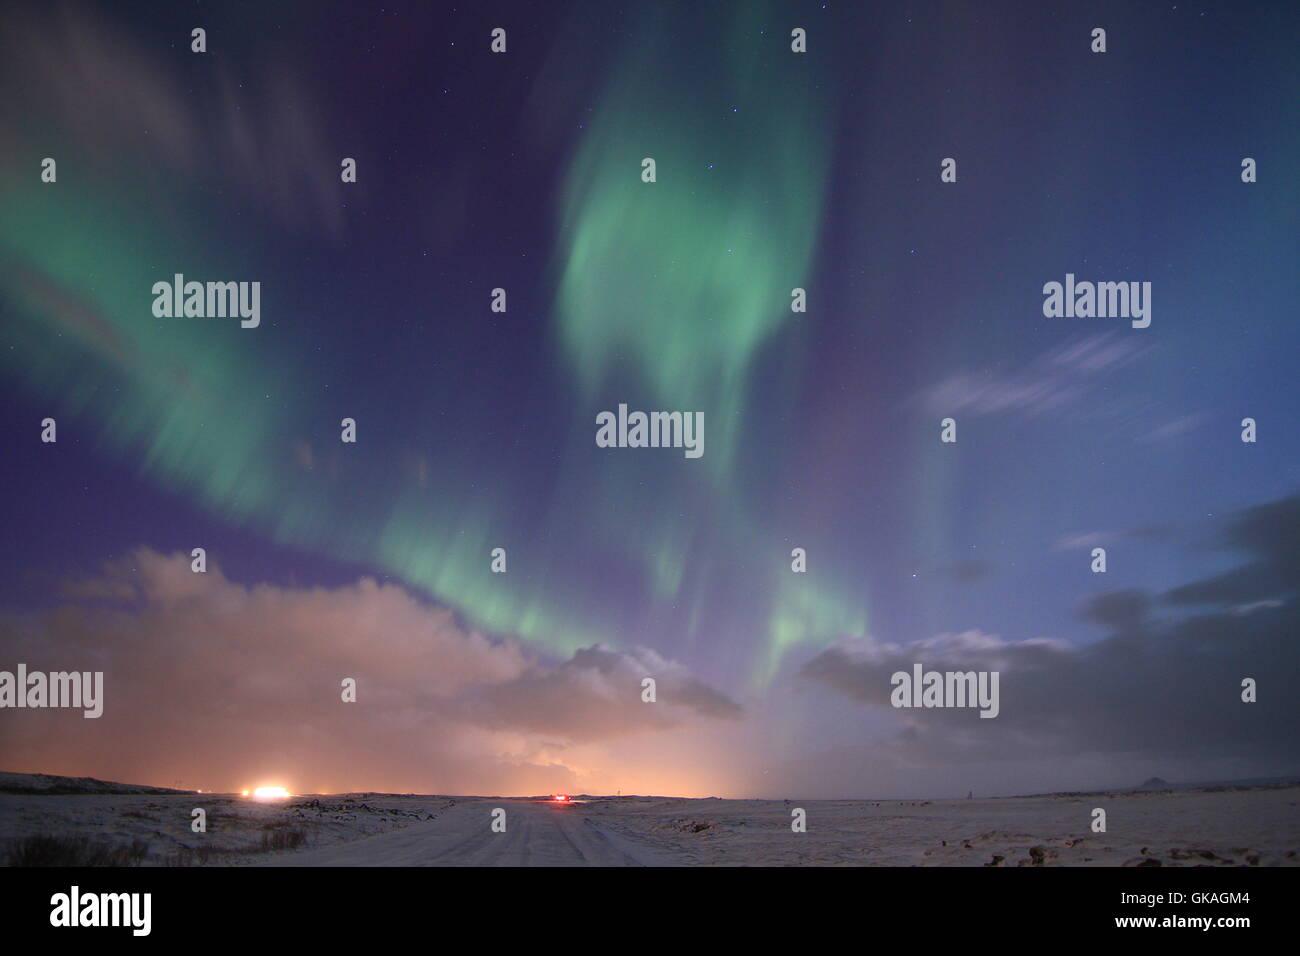 iceland stars asterisks - Stock Image